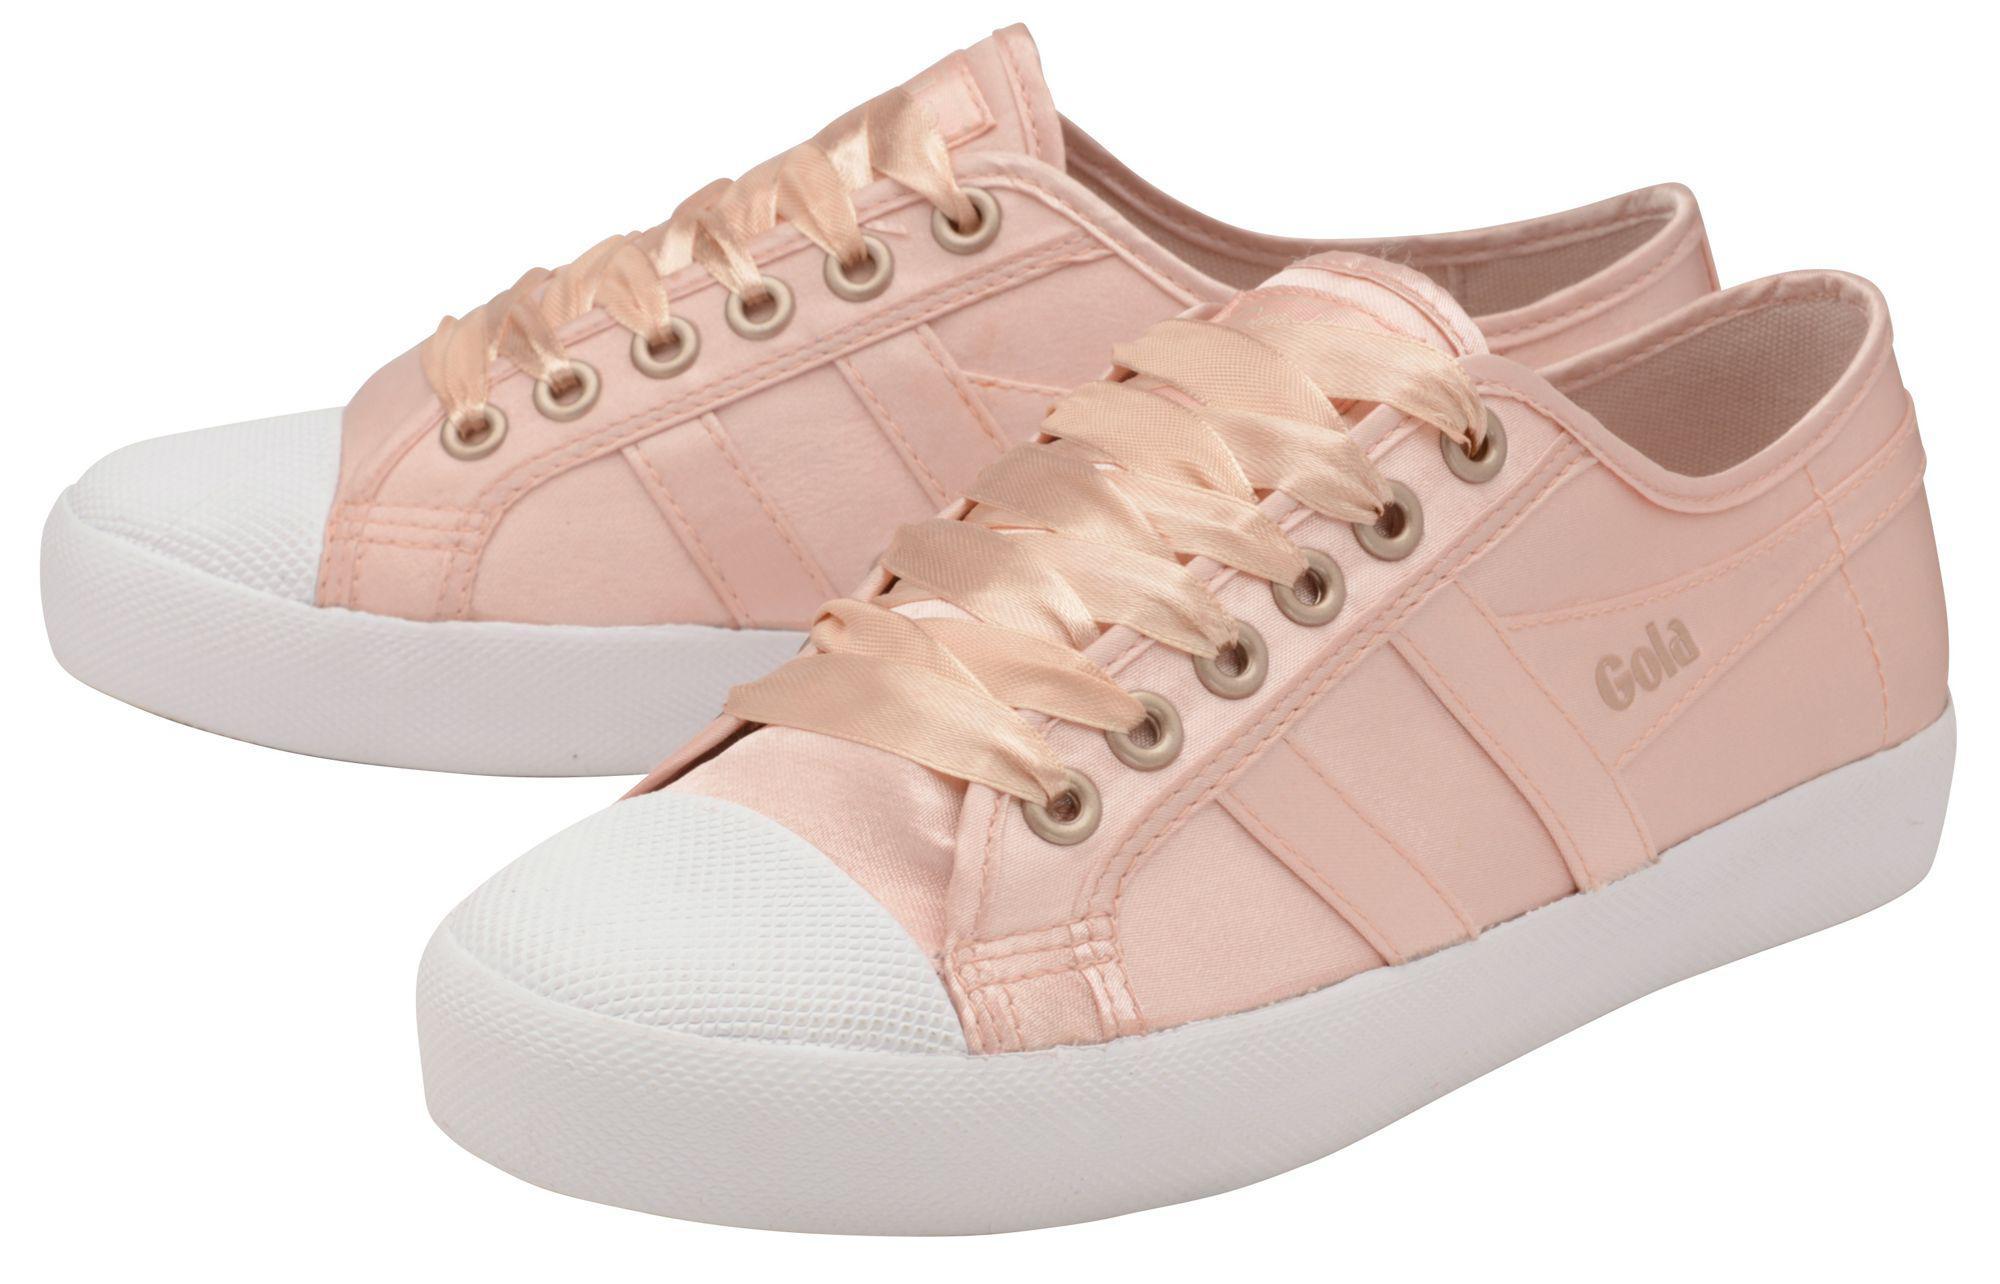 Gola Coaster Satin Sneaker in Pink